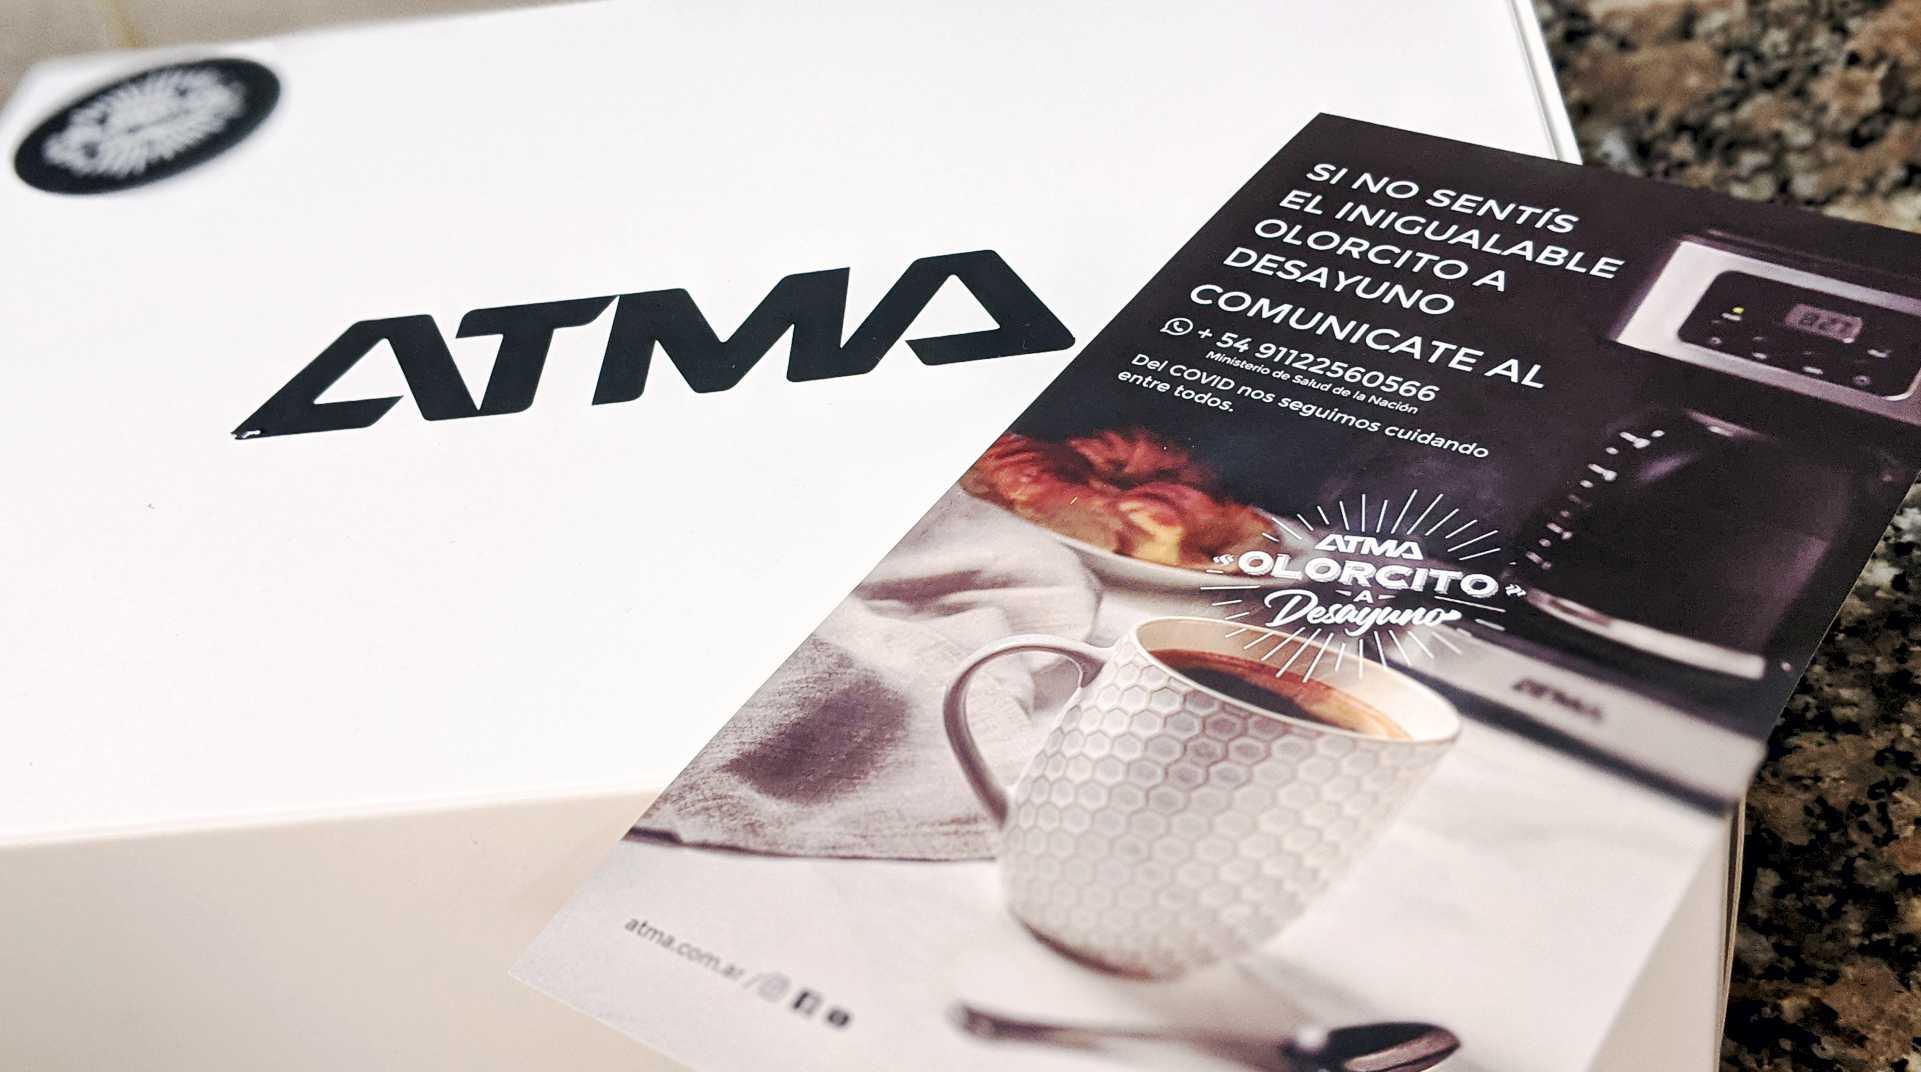 Giftbox de Tentate o testeate, la campaña de Atma con Olorcito a Desayuno